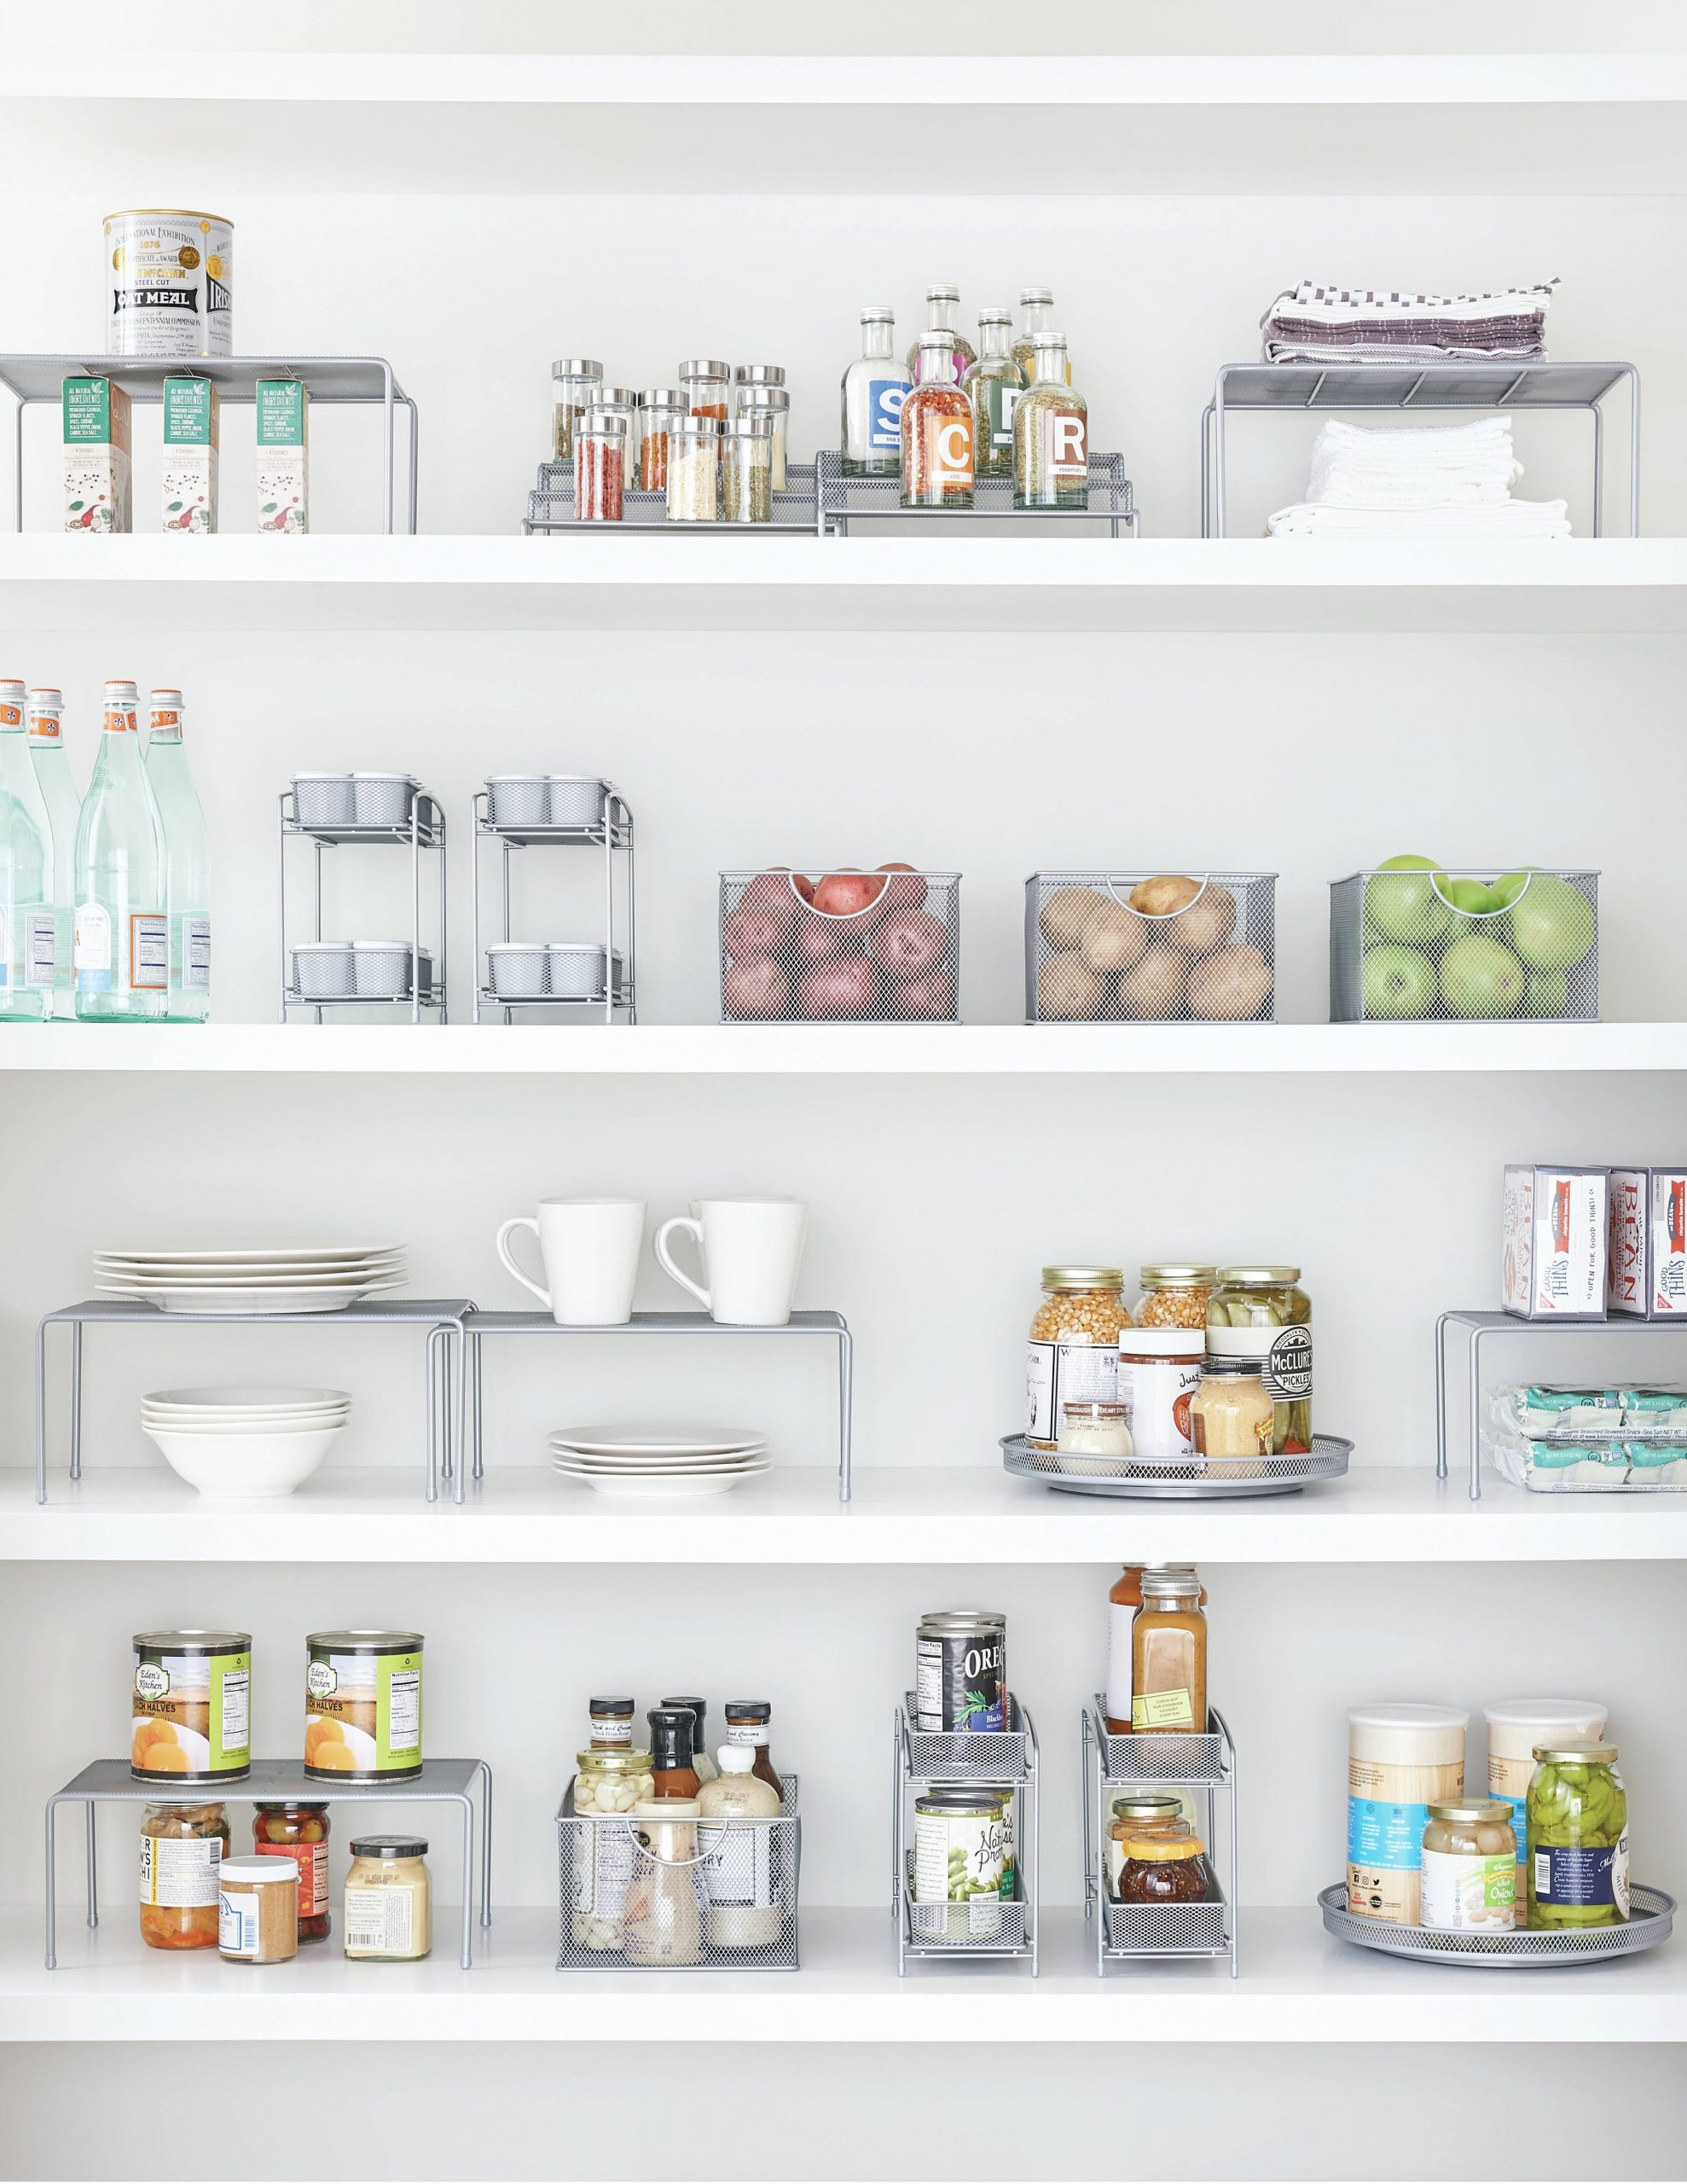 ORG 9-Tier Expandable Metal Mesh Shelf - Org Metal Mesh Kitchen Cabinet Organizer